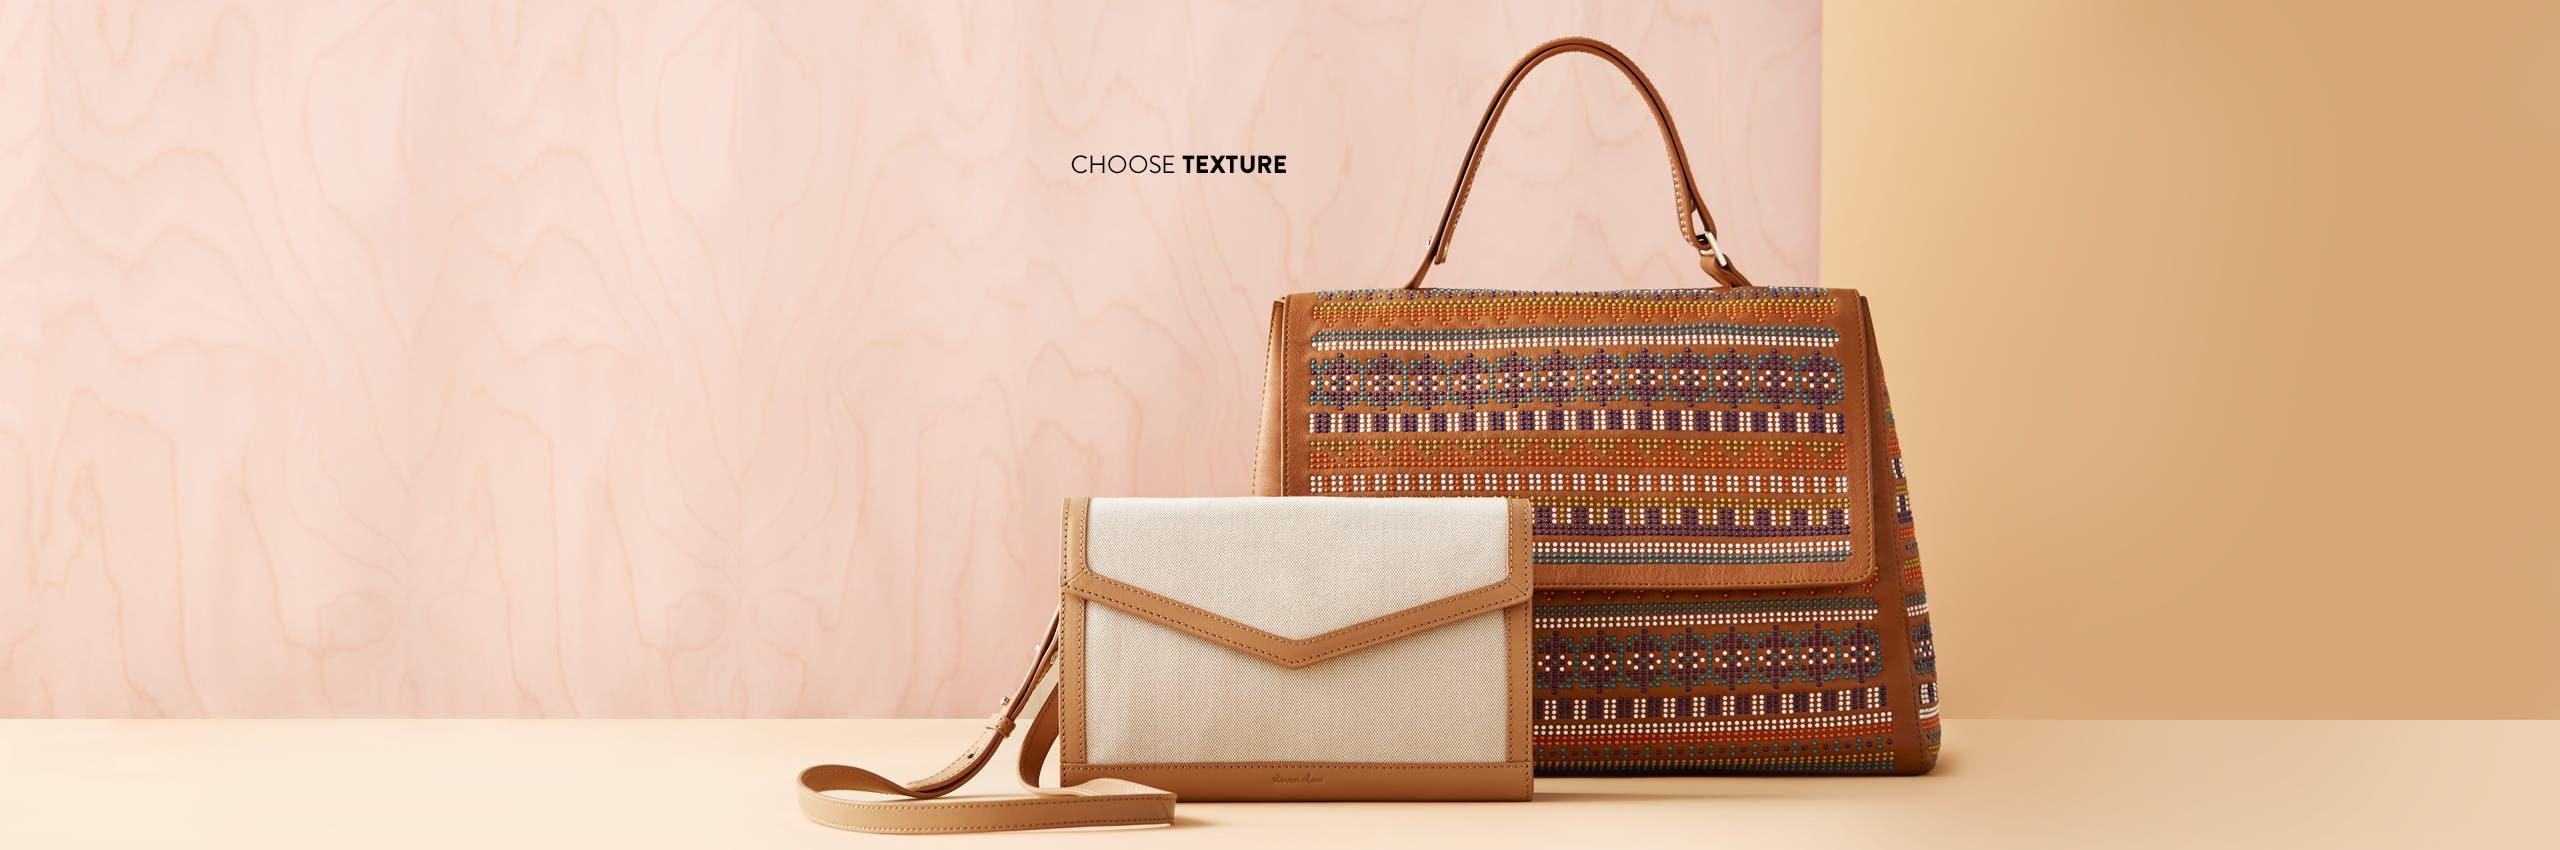 Choose texture.